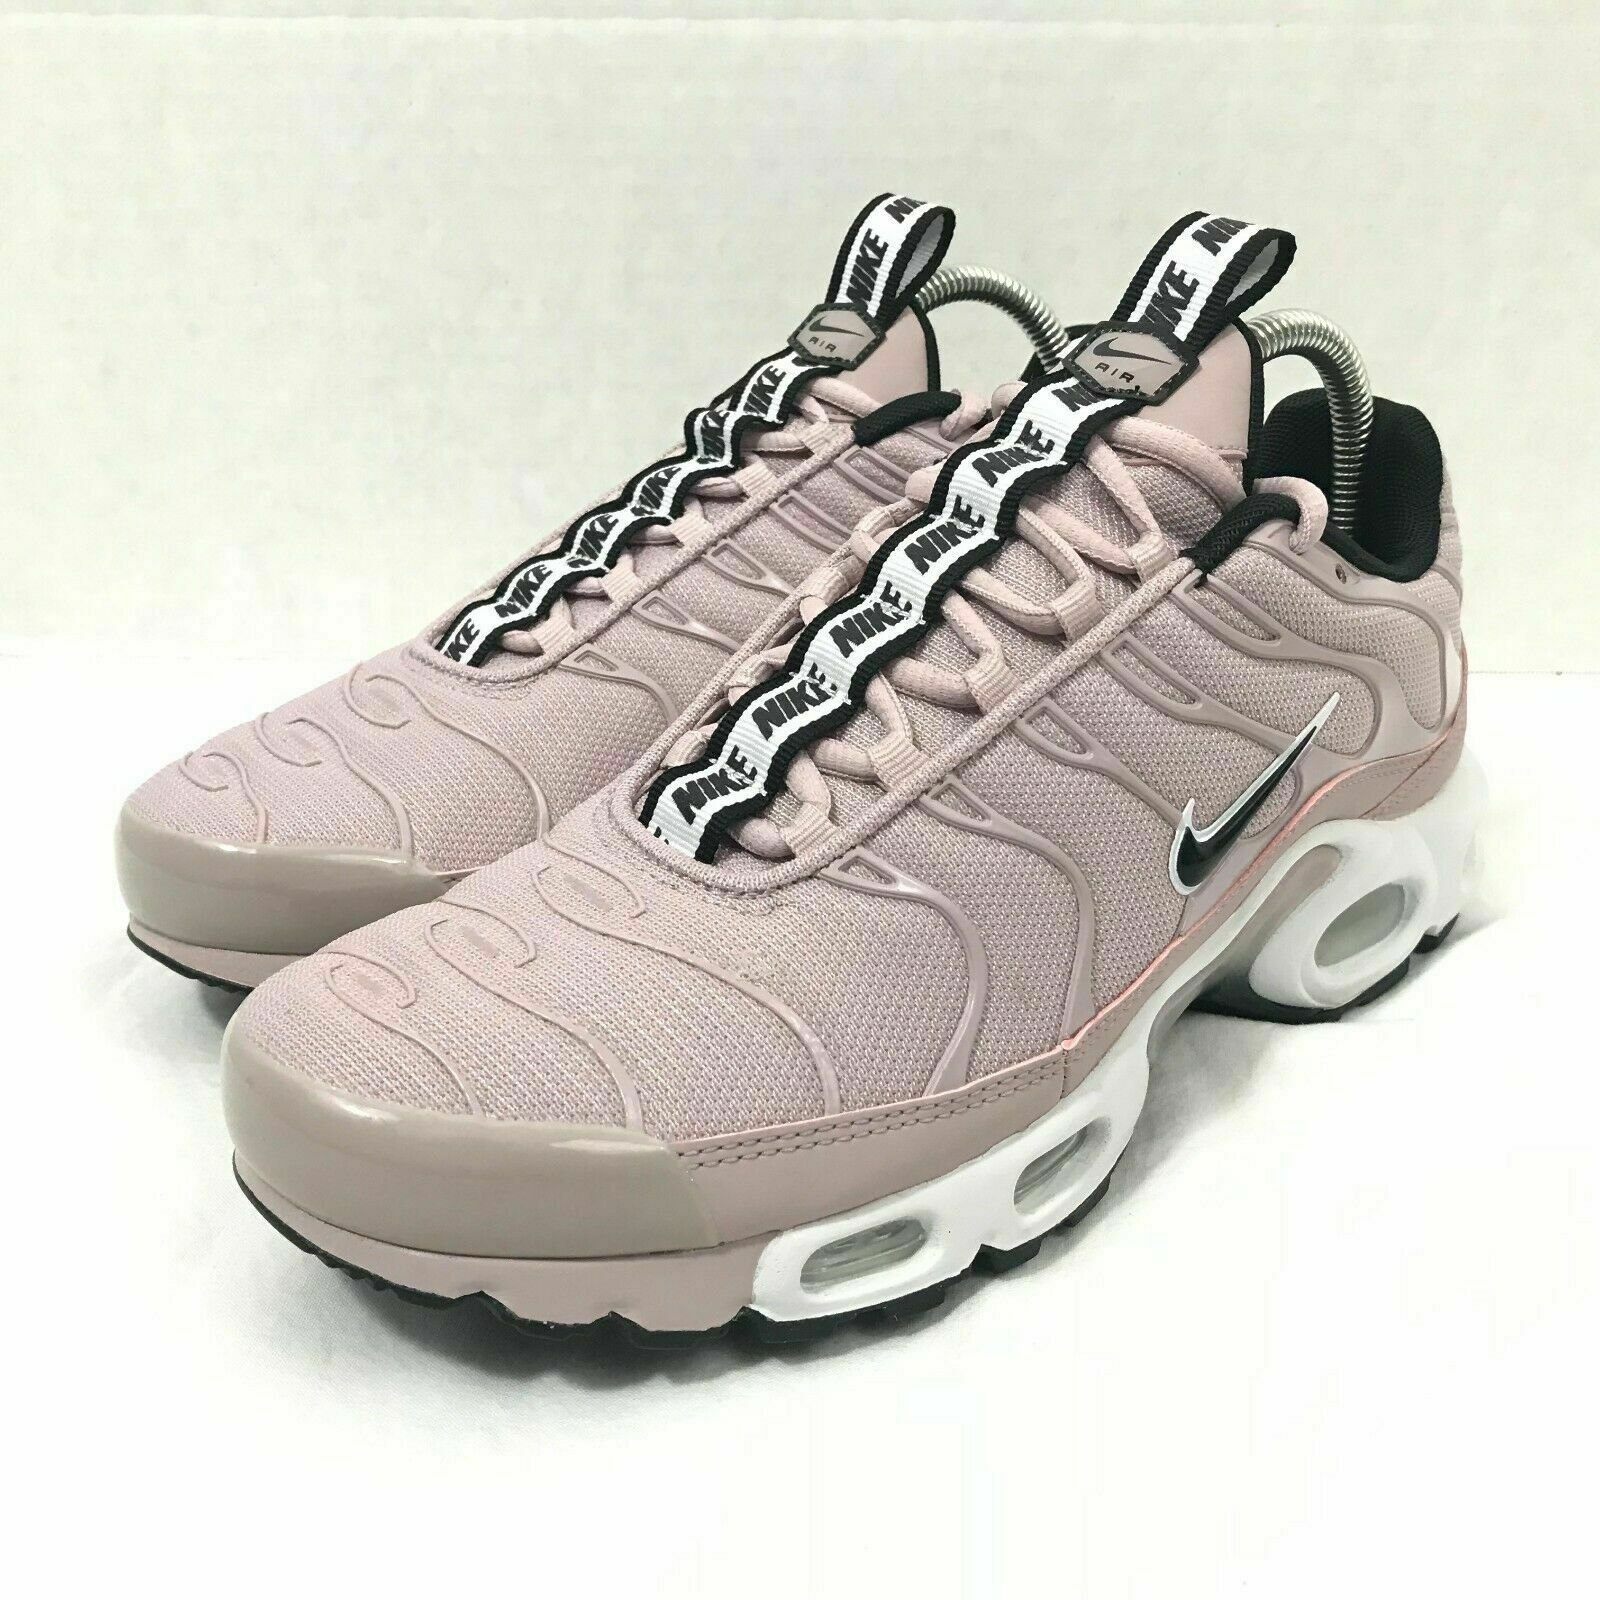 Nike Air Max Plus TN SE Particle Rose Size UK 8.5 US 9.5 EUR 43 Aq4128 600 Pink